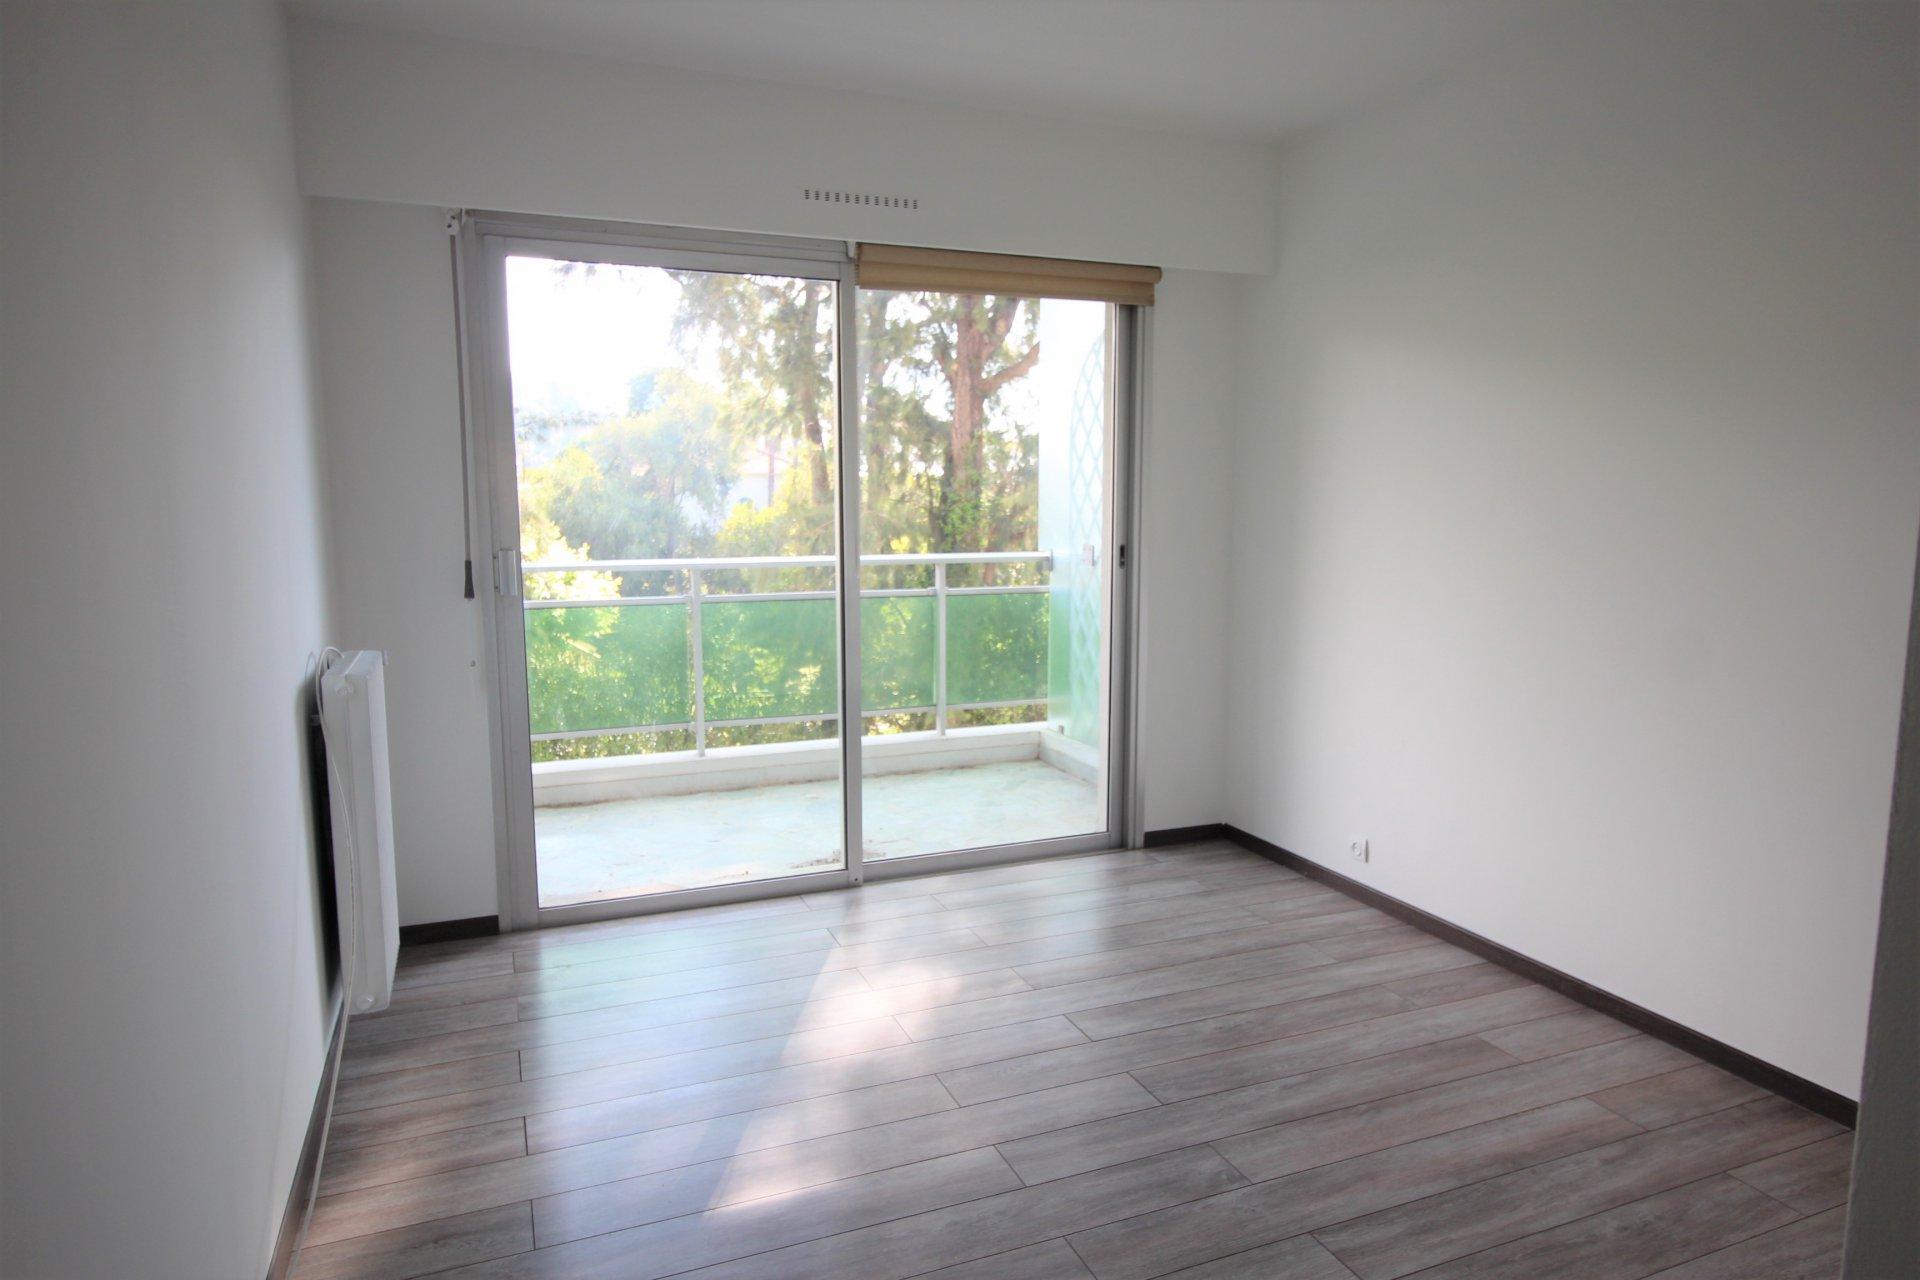 Cannes, Basse-Californie, 2 bedrooms apartment empty, terrace, 2 parkings, cellar